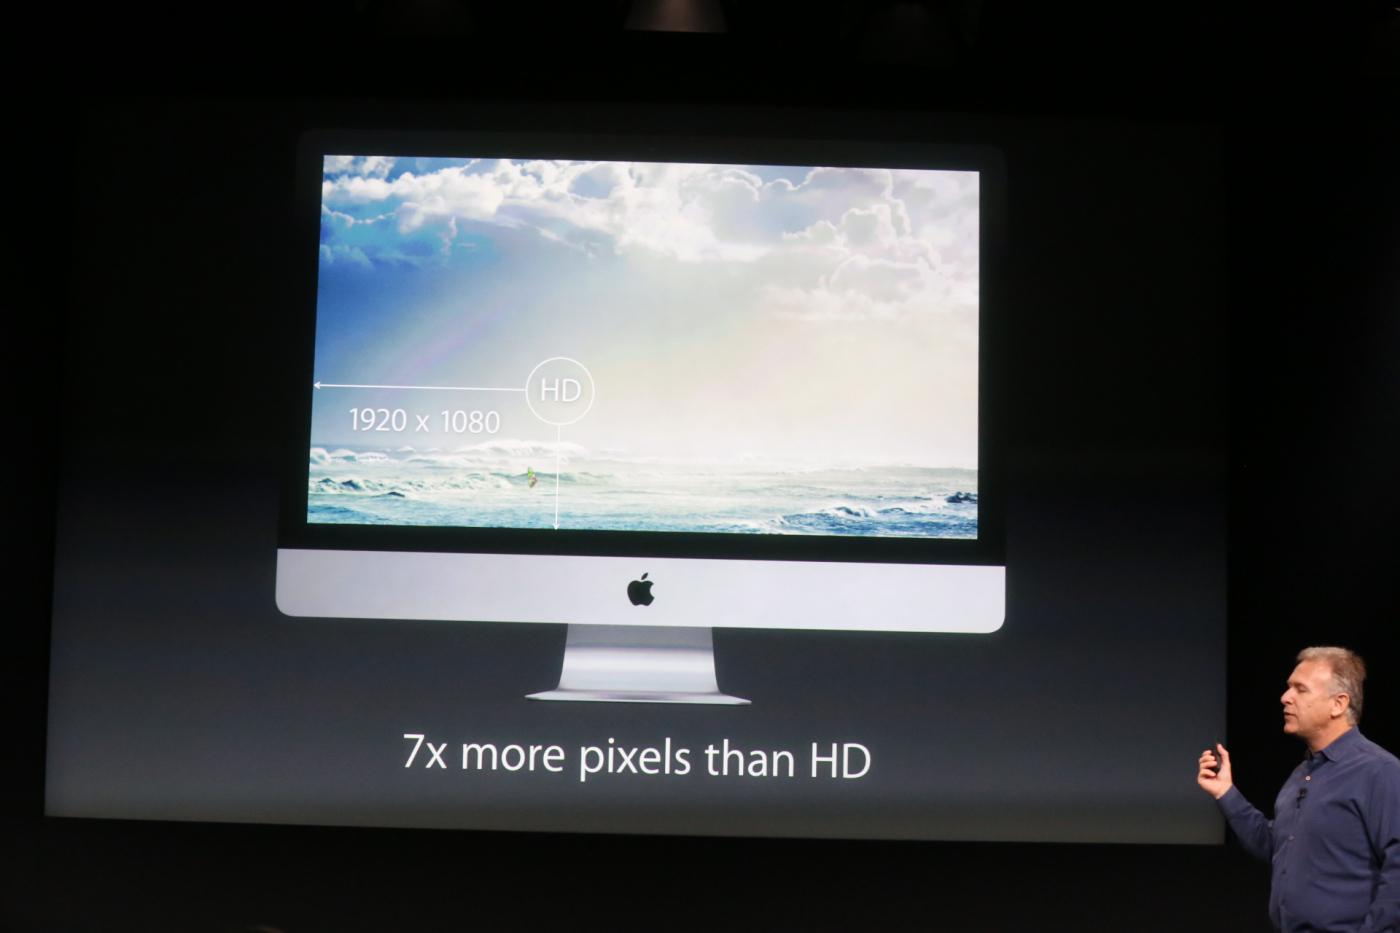 ipad-mac-event0217